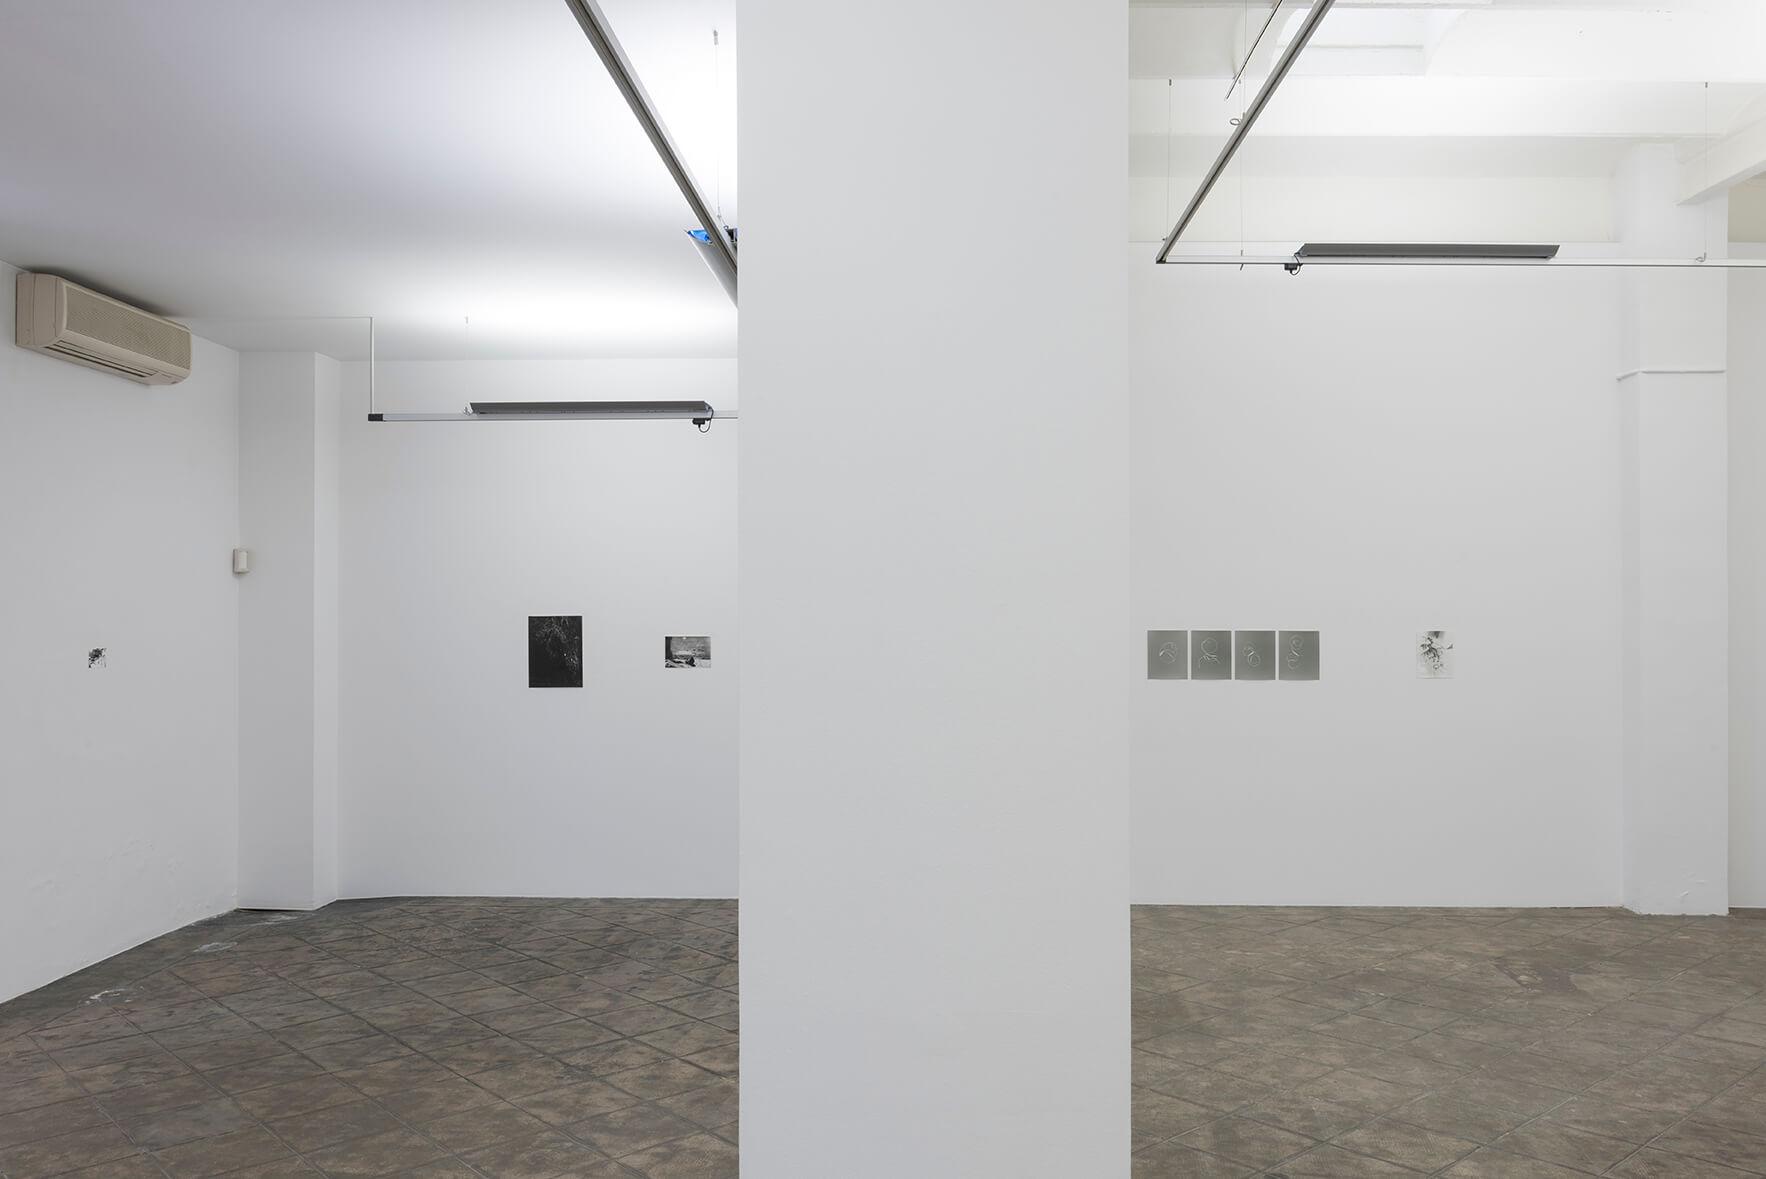 Installation view: Zostera & Posidonia, ProjecteSD | Zostera & Posidonia | ProjecteSD